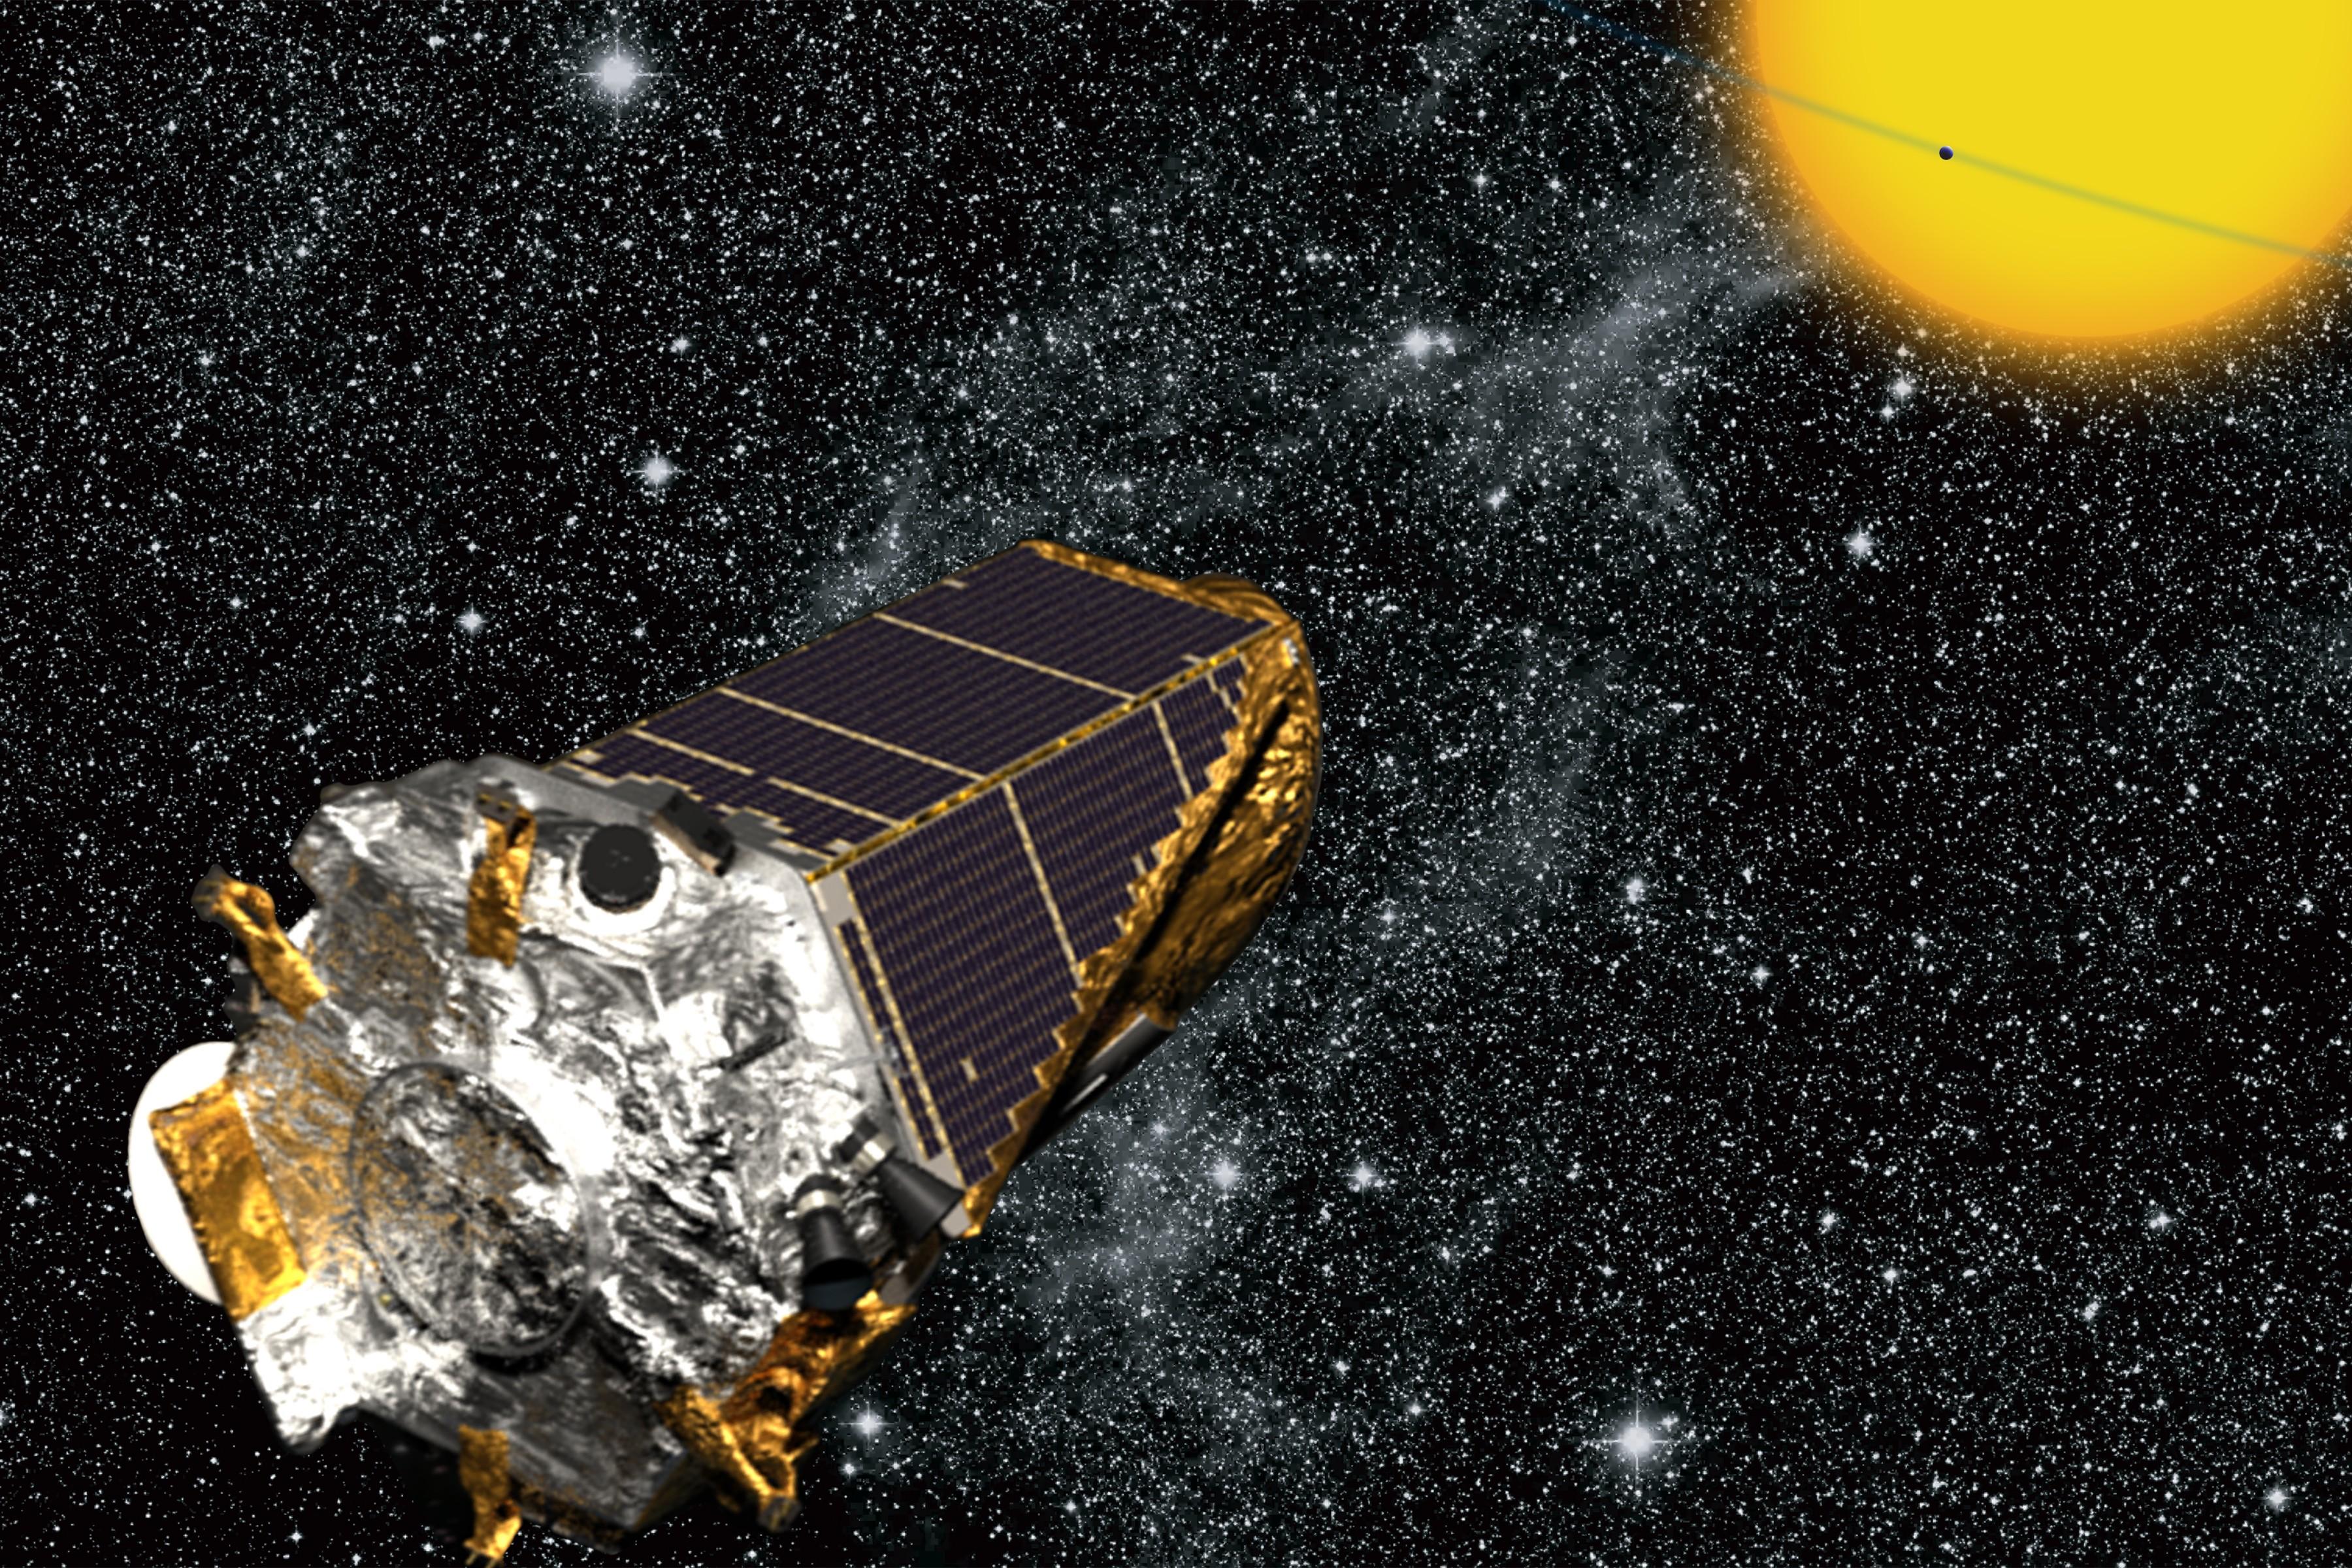 Montagem do telescópio Kepler explorando o Universo (Foto: NASA/Kepler mission/Wendy Stenzel)